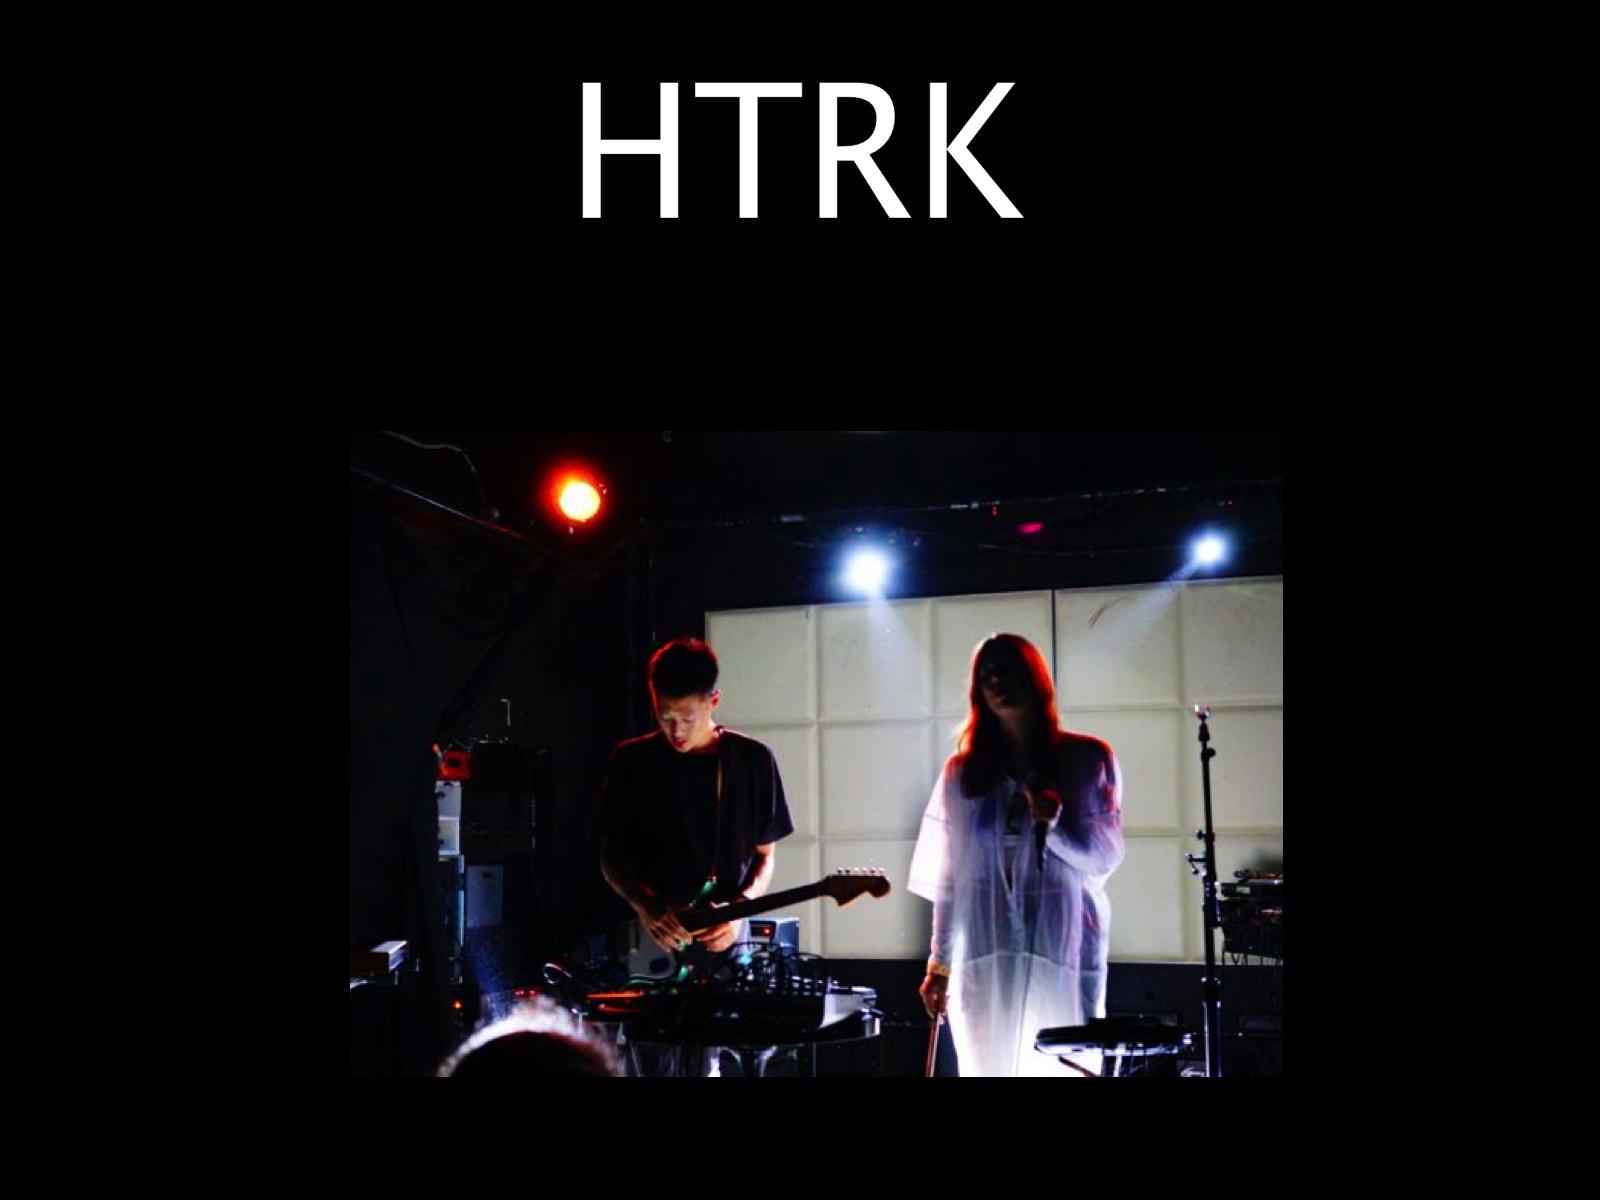 HTRK @ ECHO